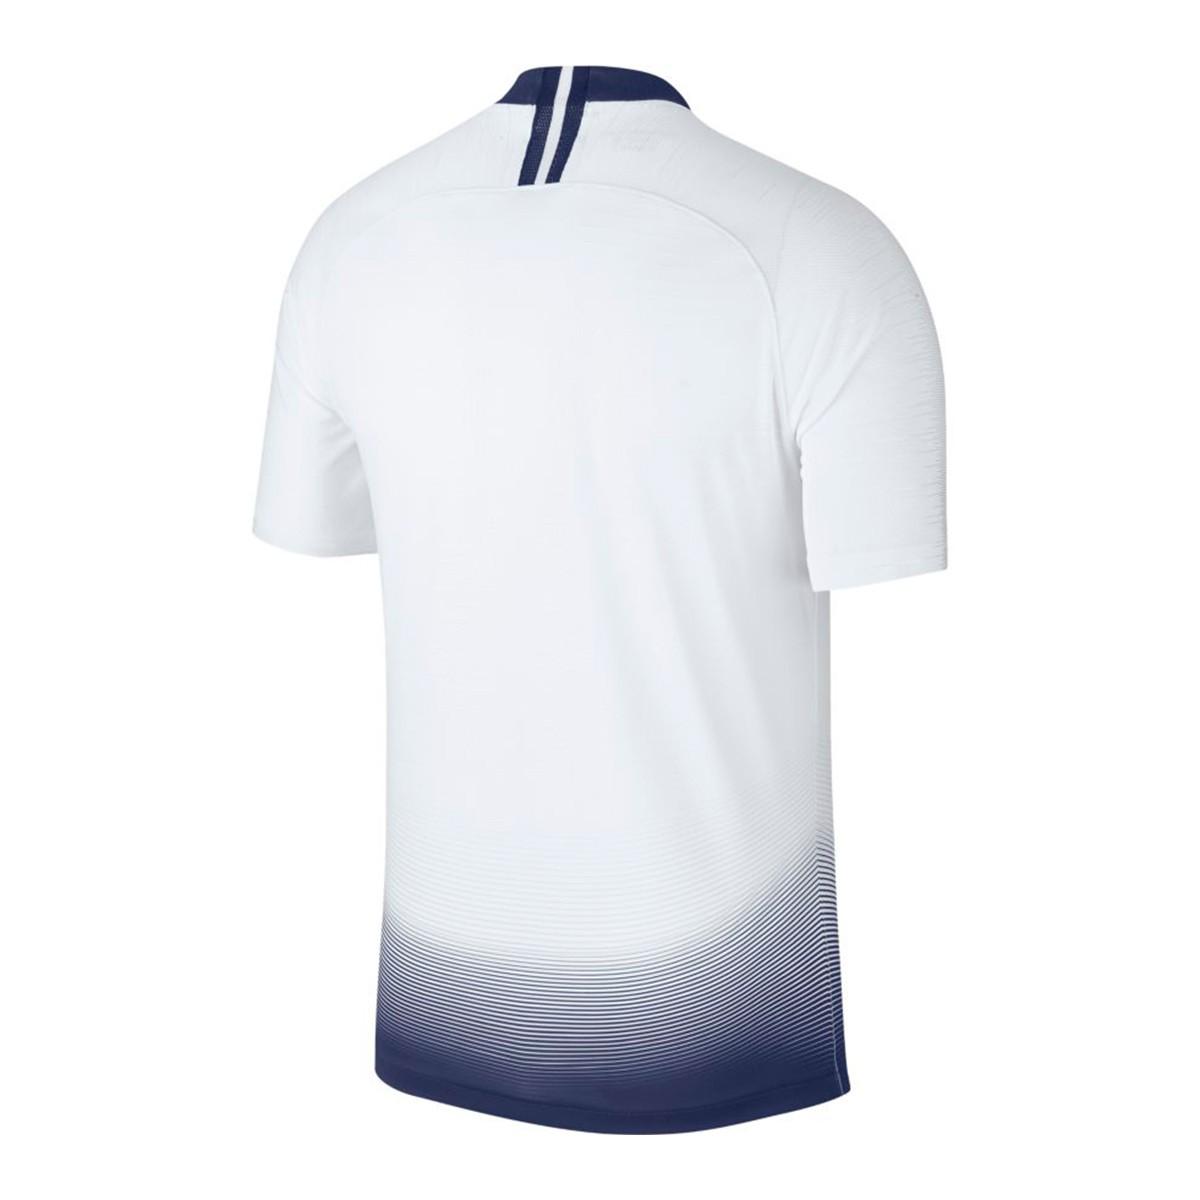 c29e050038431 Camiseta Nike Vapor Tottenham Hotspur FC Primera Equipación 2018-2019  White-Binary blue - Tienda de fútbol Fútbol Emotion